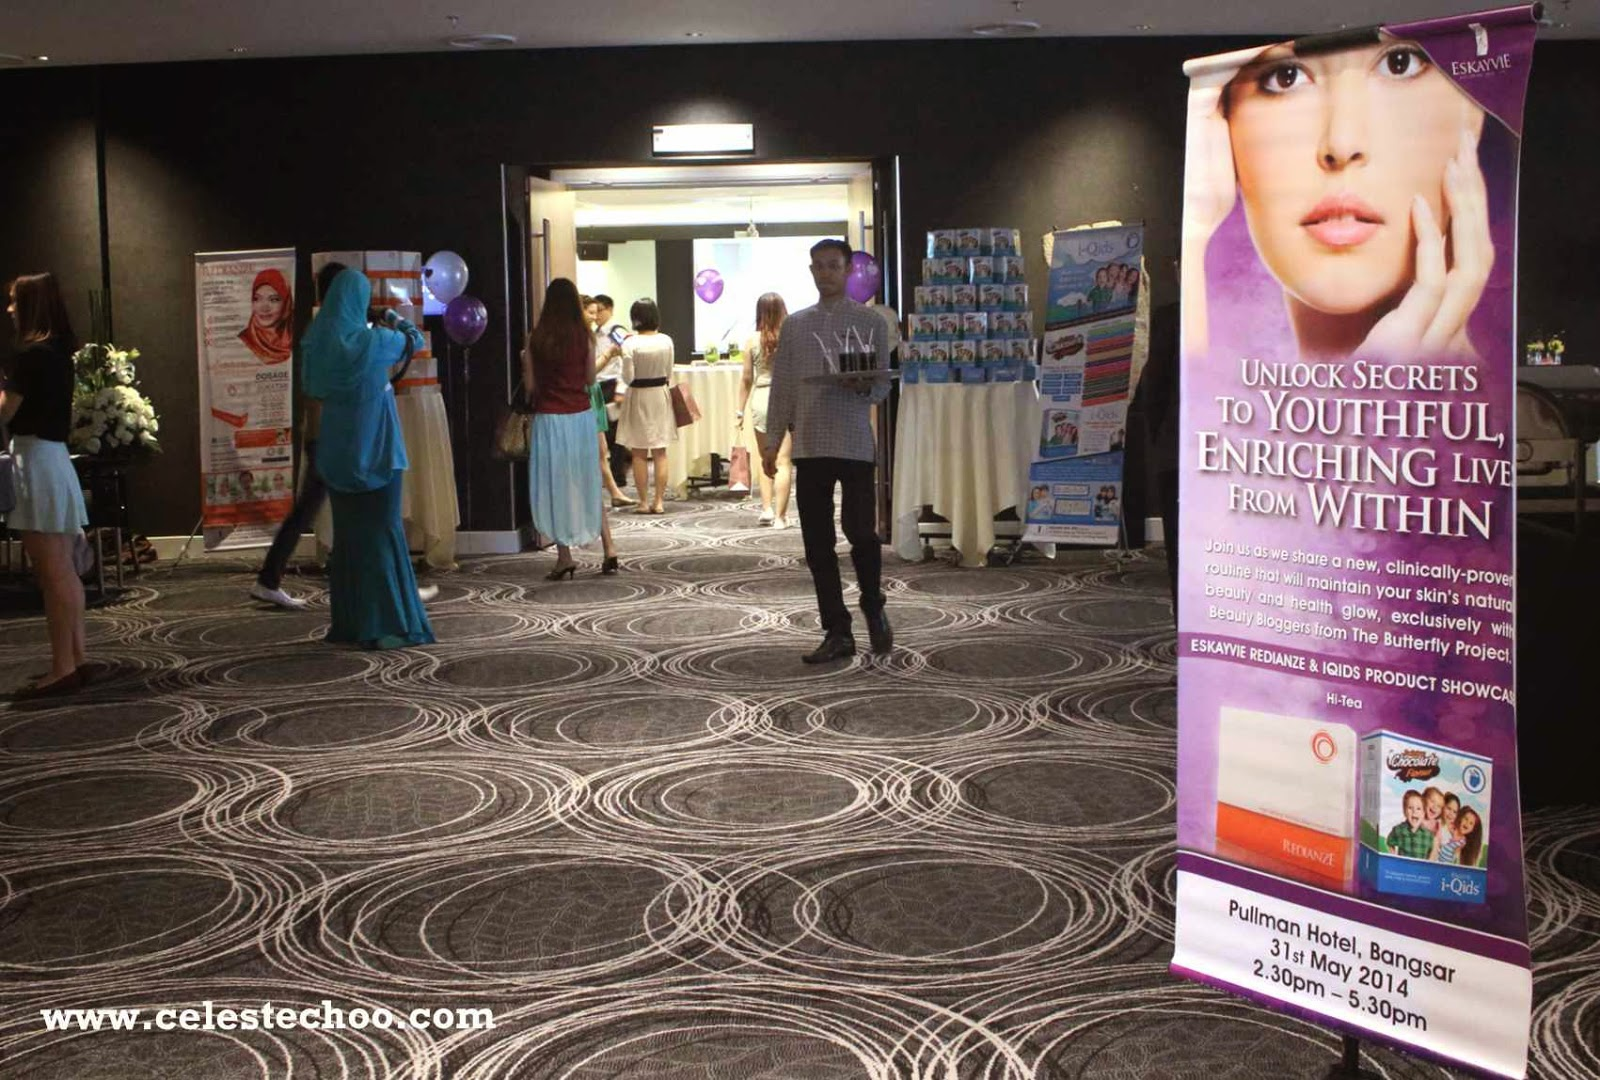 eskayvie_health_beauty_supplements_antiaging_blogger_event